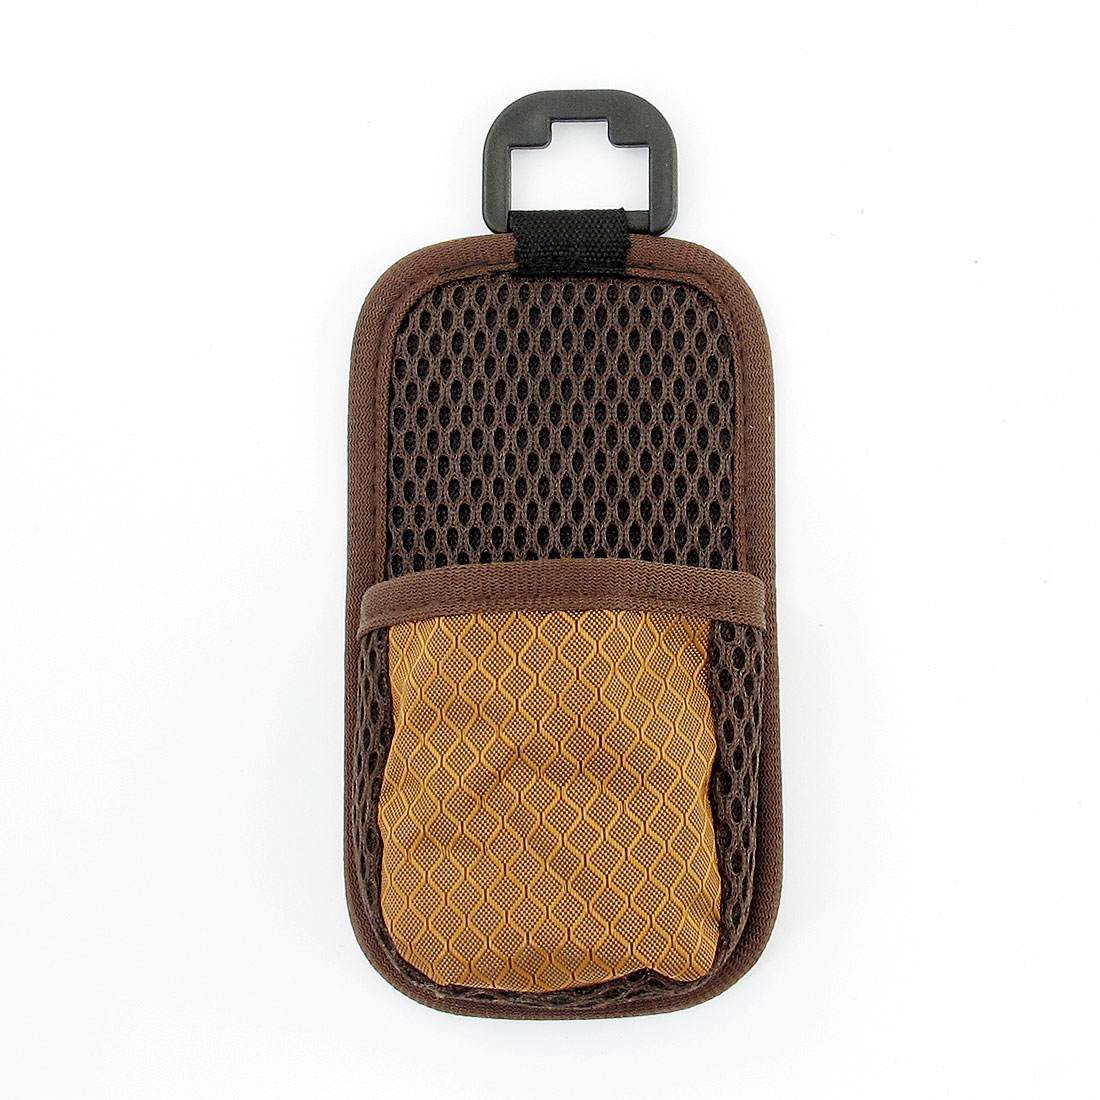 Car Air Vent Mount Brown Nylon Mesh Phone Pocket Bag Pouch Holder